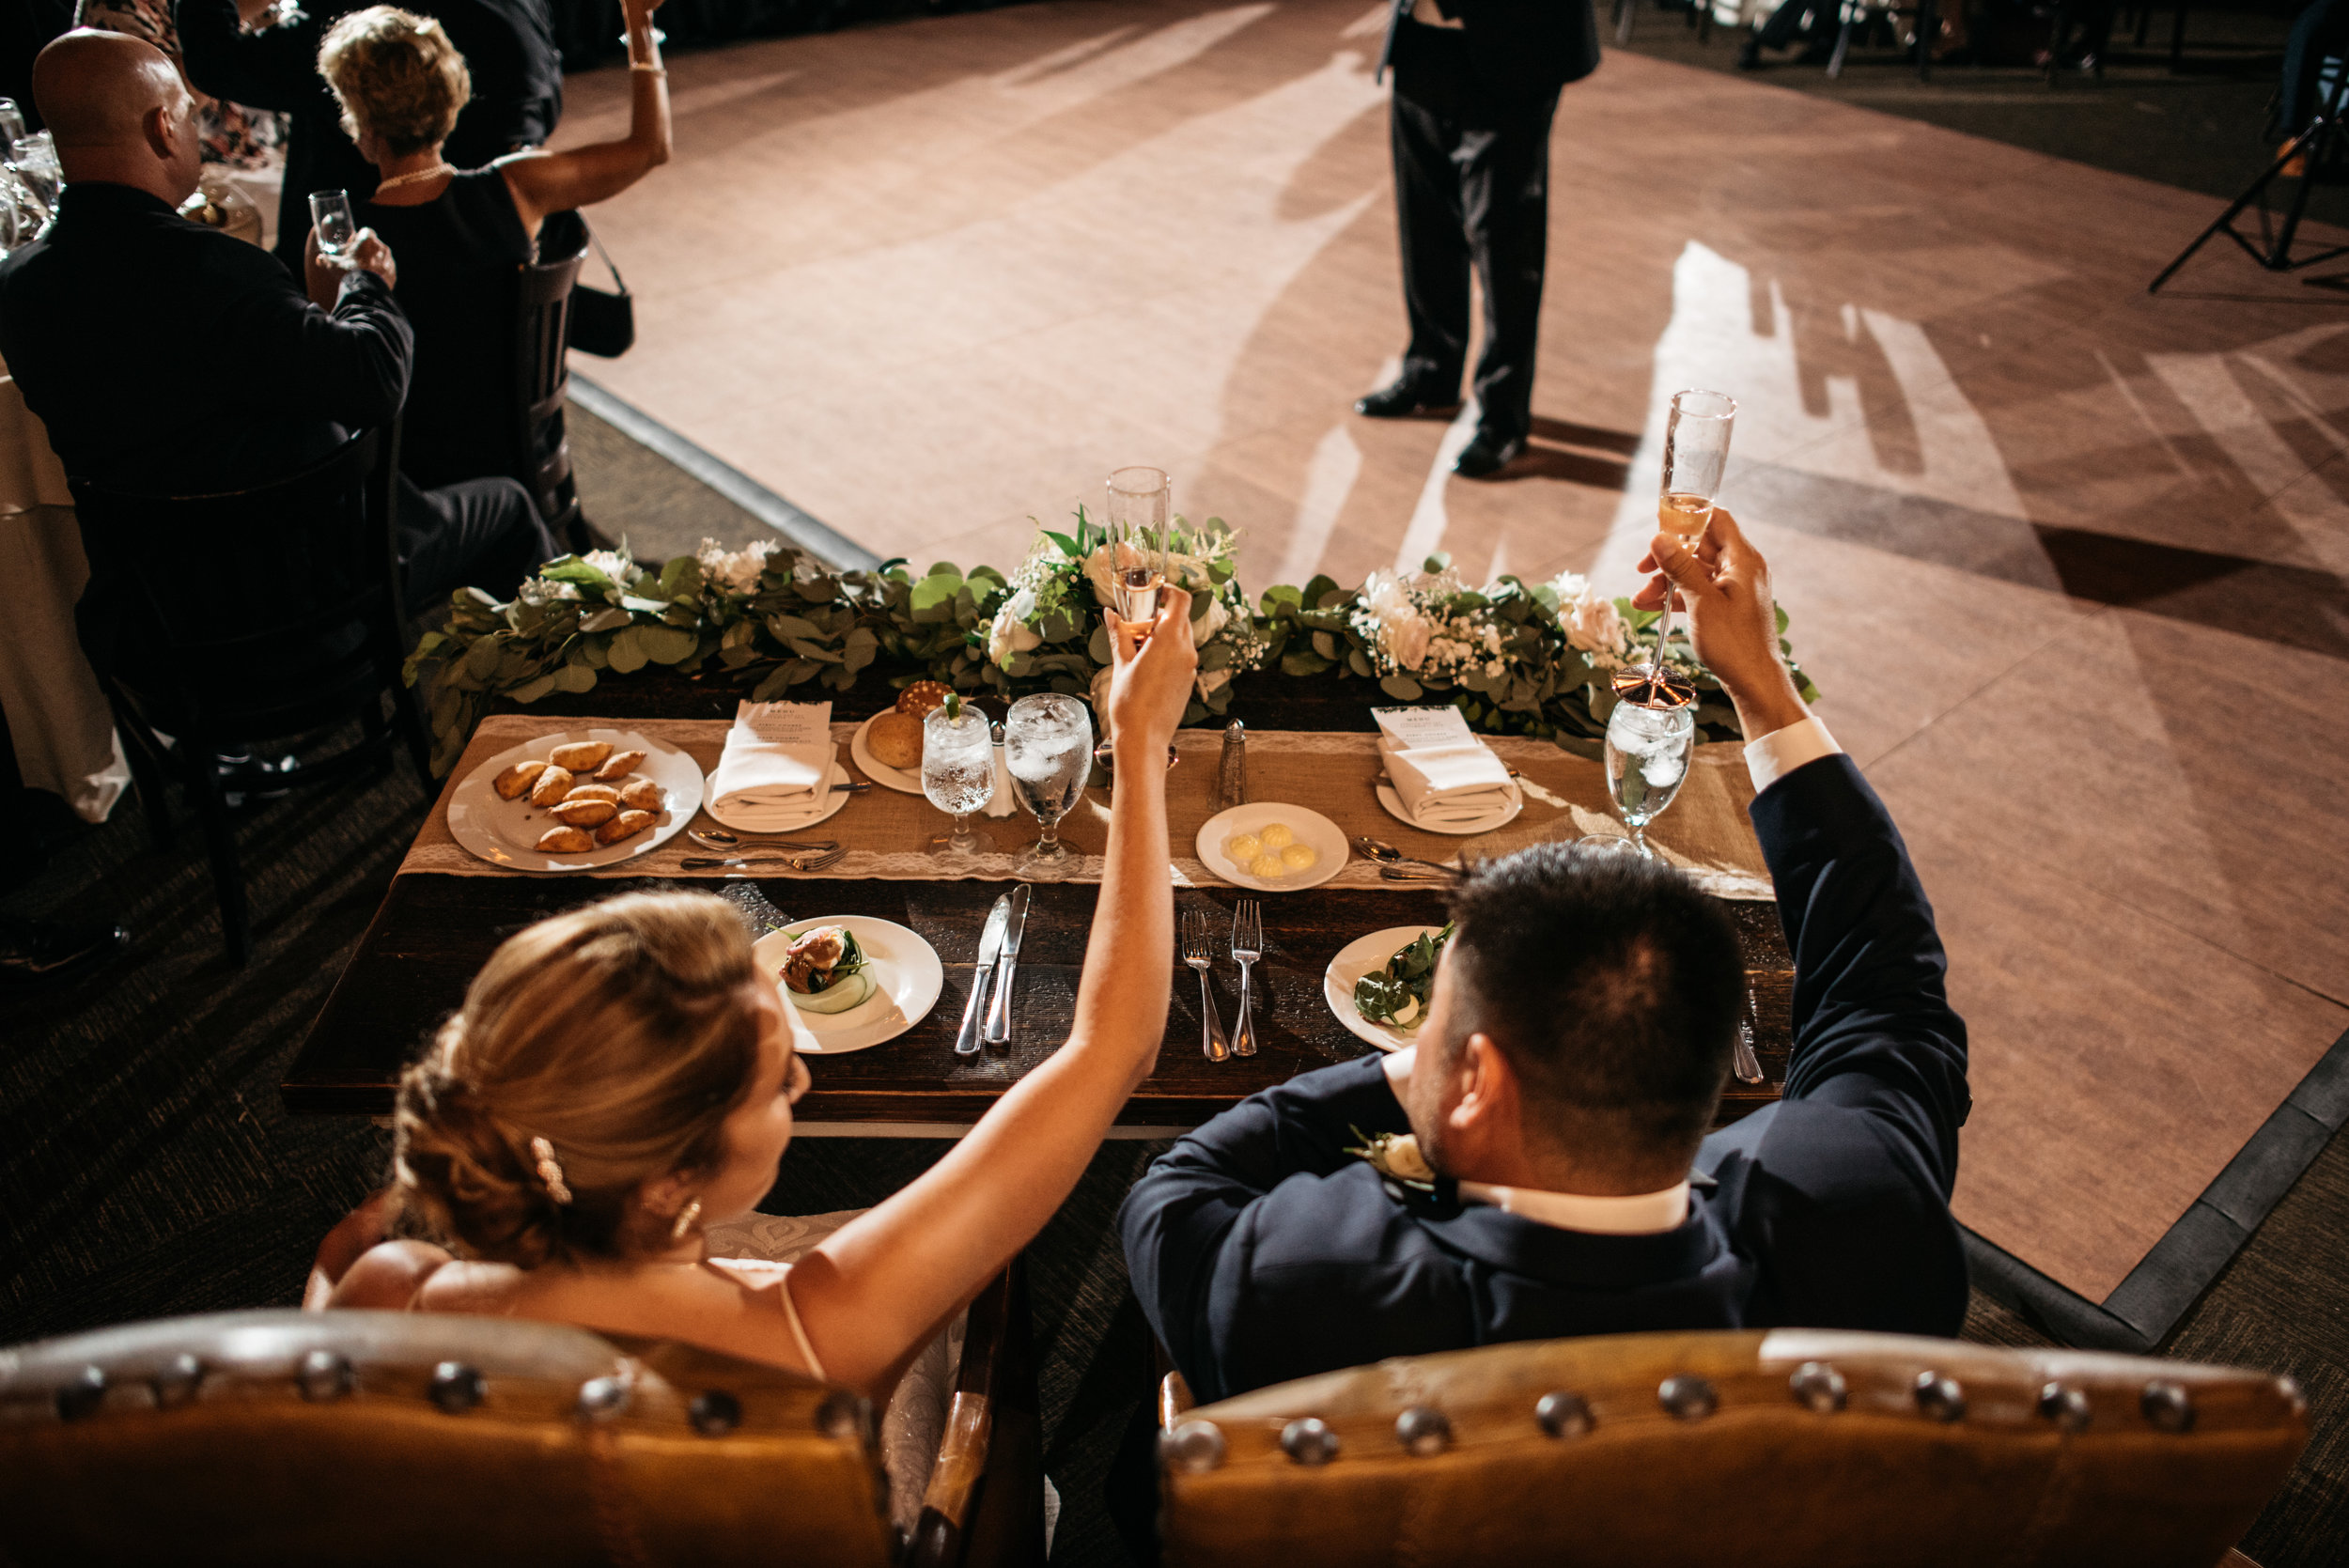 WeddingPhotos | NJPhotographer | Highlights-13-6.jpg